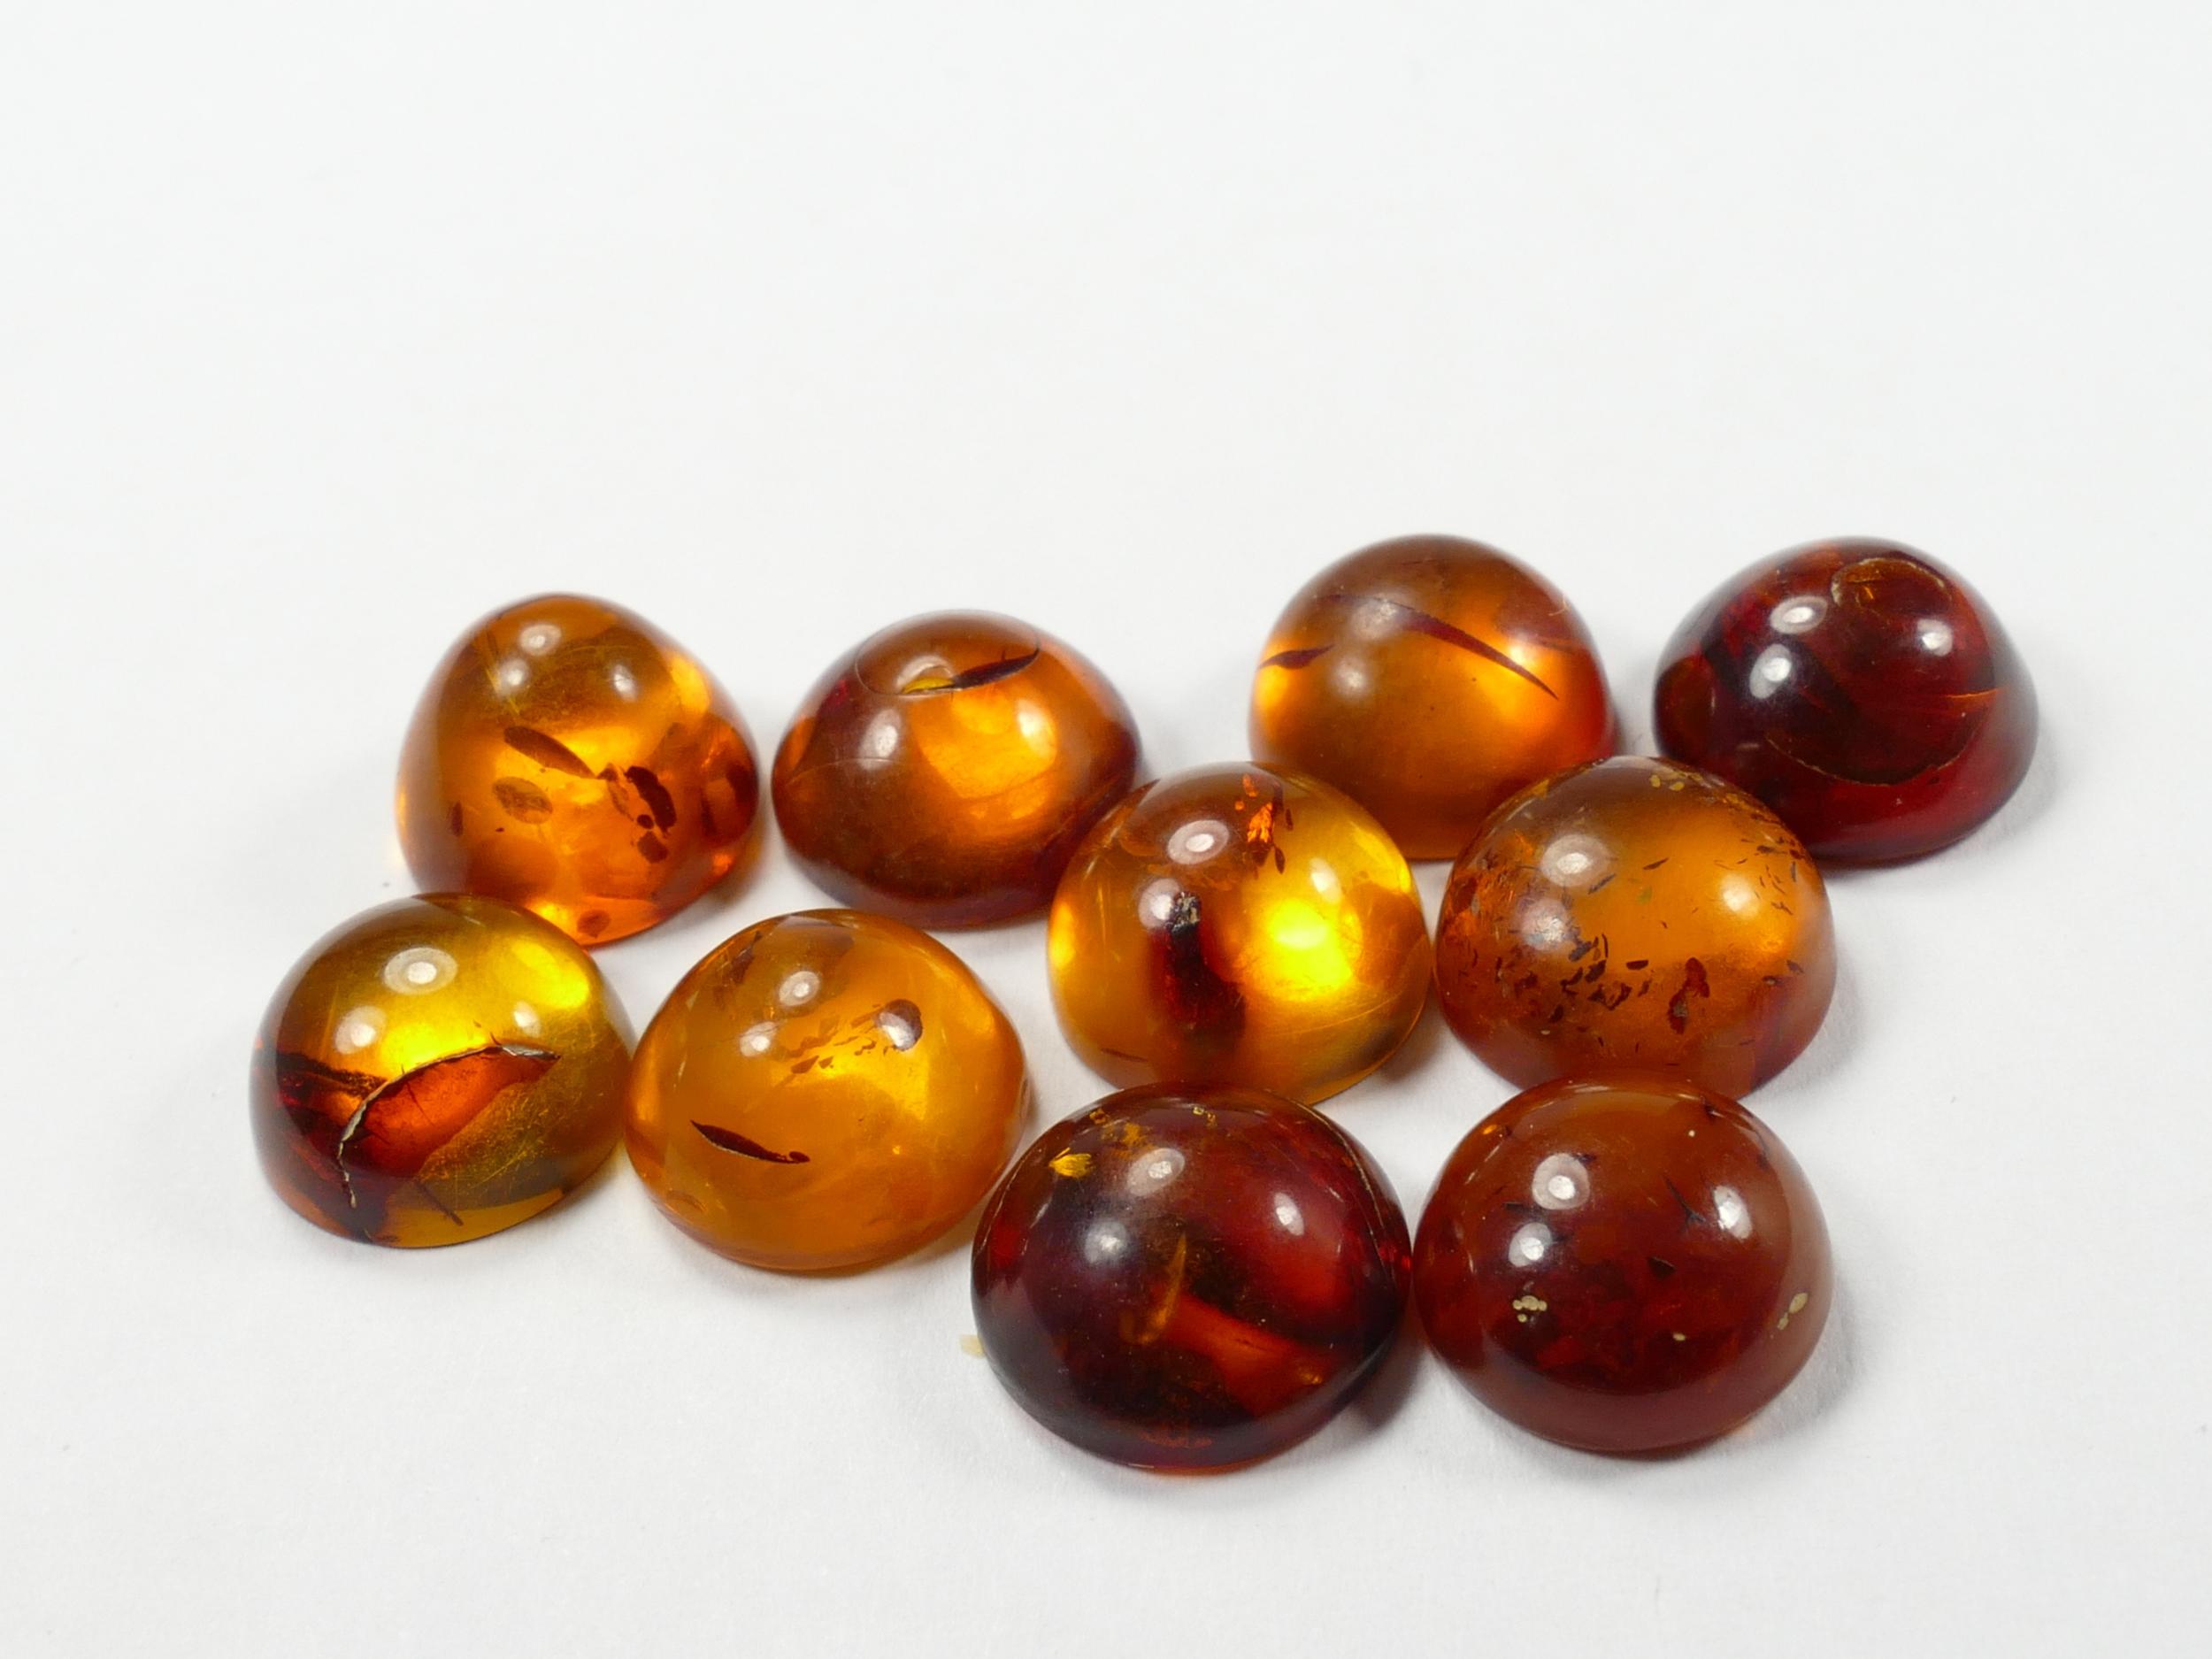 10mm Lot de 10 Ambre naturel natif de la Mer Baltique en cabochon rond orange jaune cognac (#PM123)